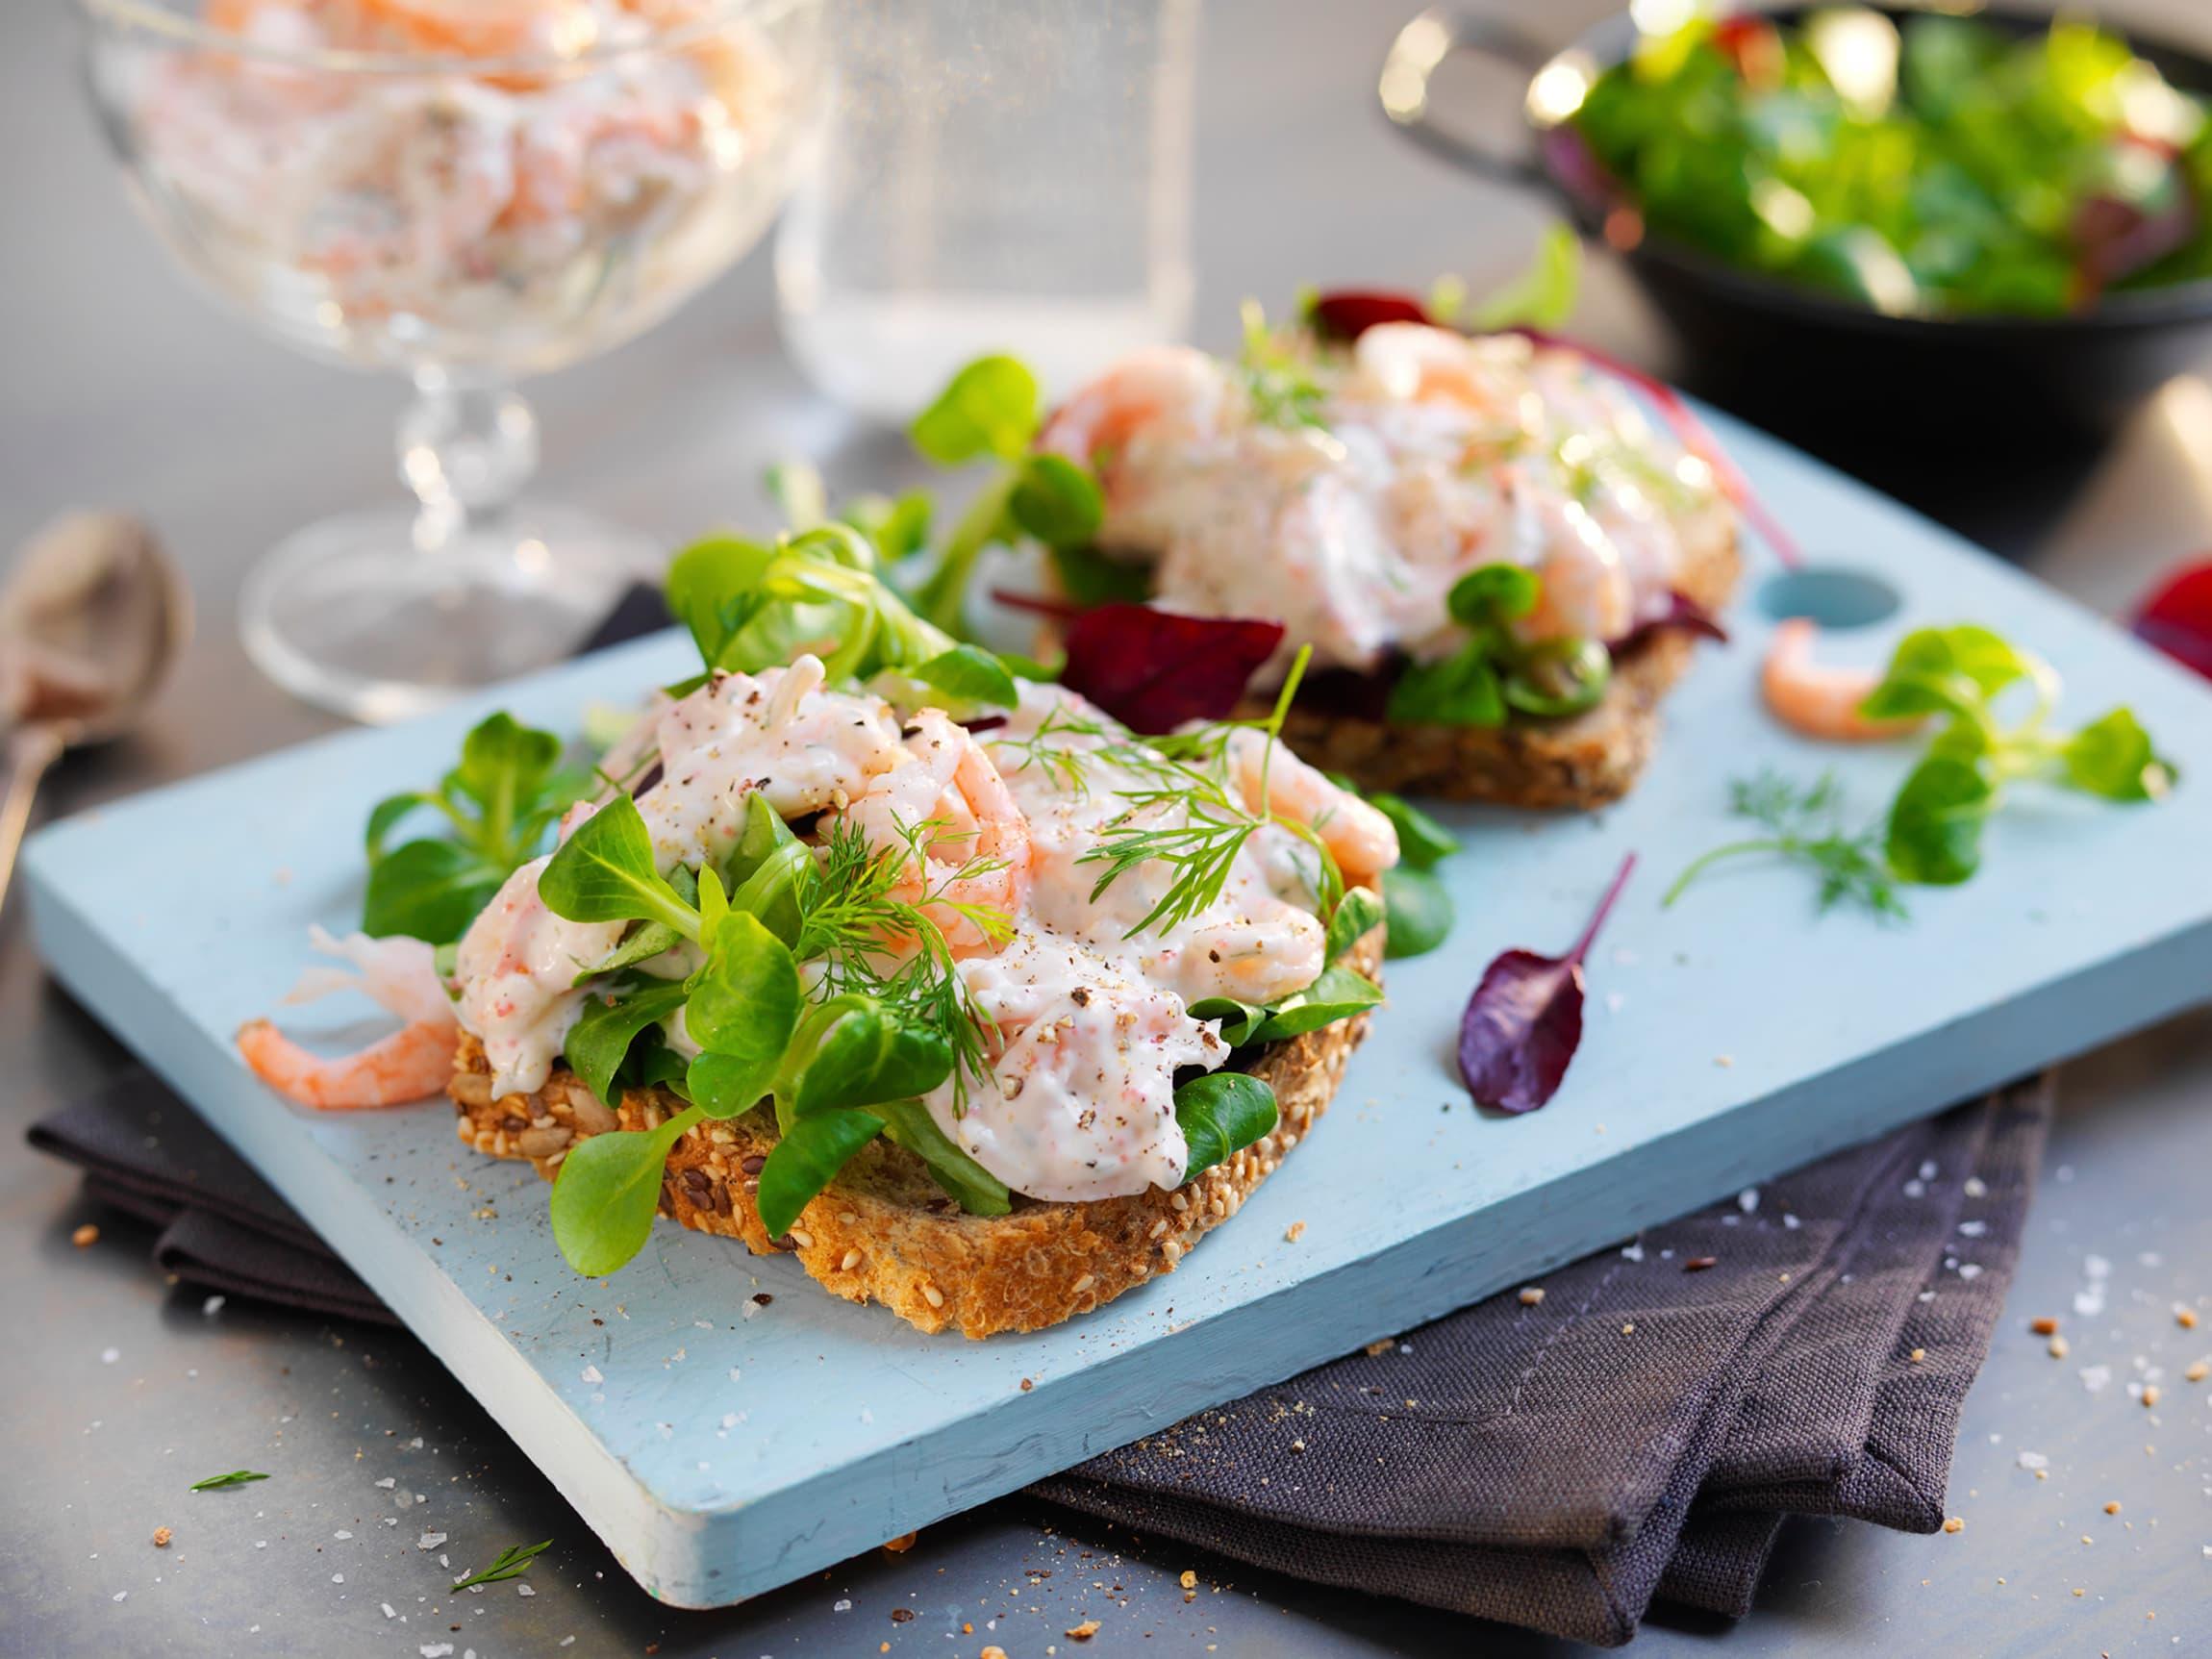 Salater med ferske kvalitetsråvarer er utrolig godt på brødskiven!